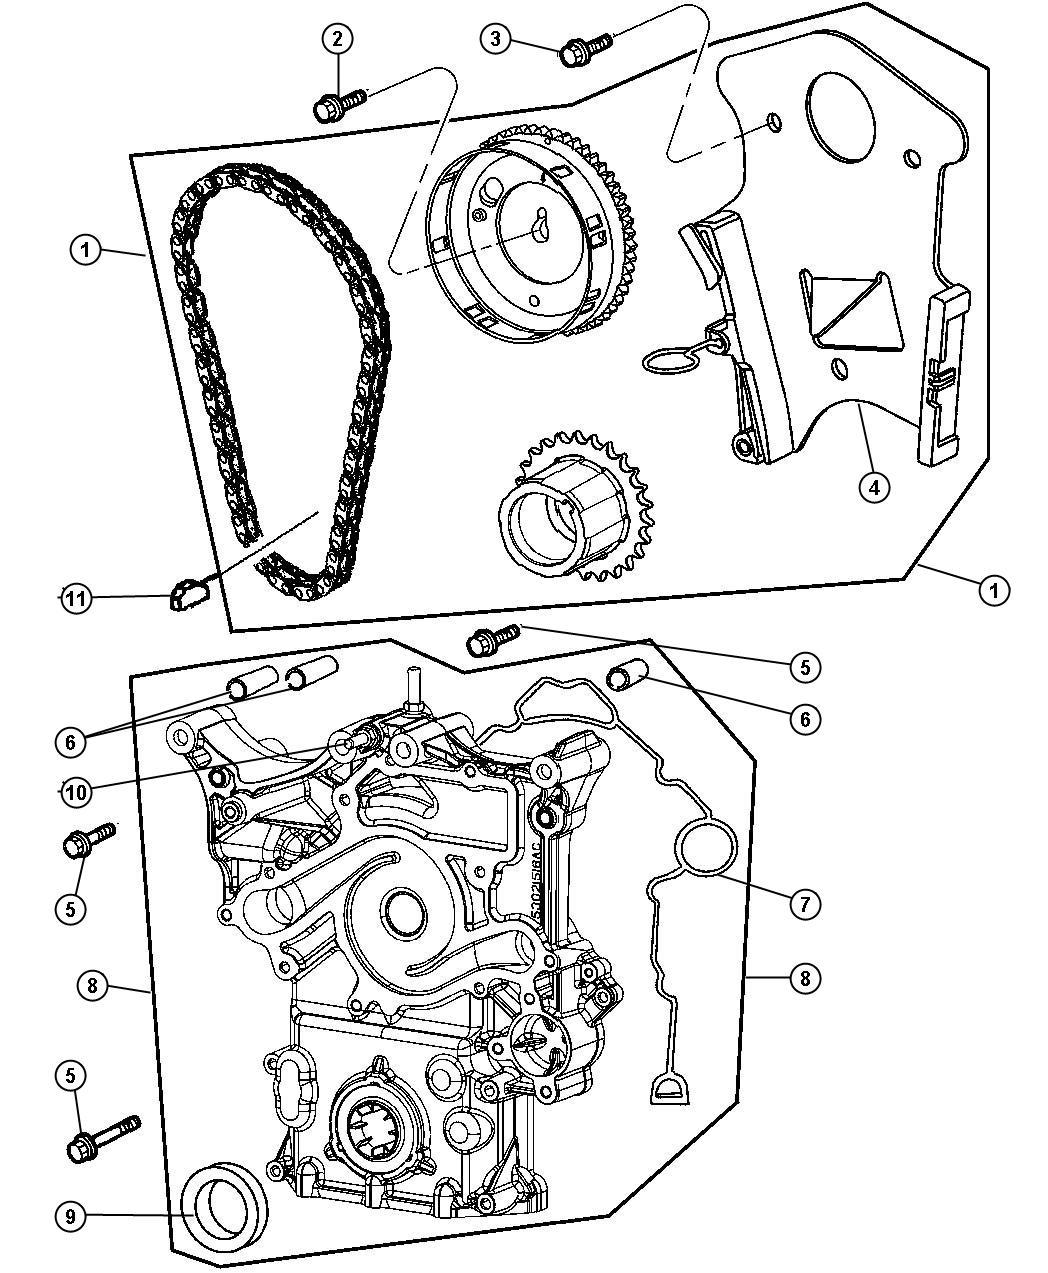 Jeep Grand Cherokee Timing Drive Kit Engine Mega Cab